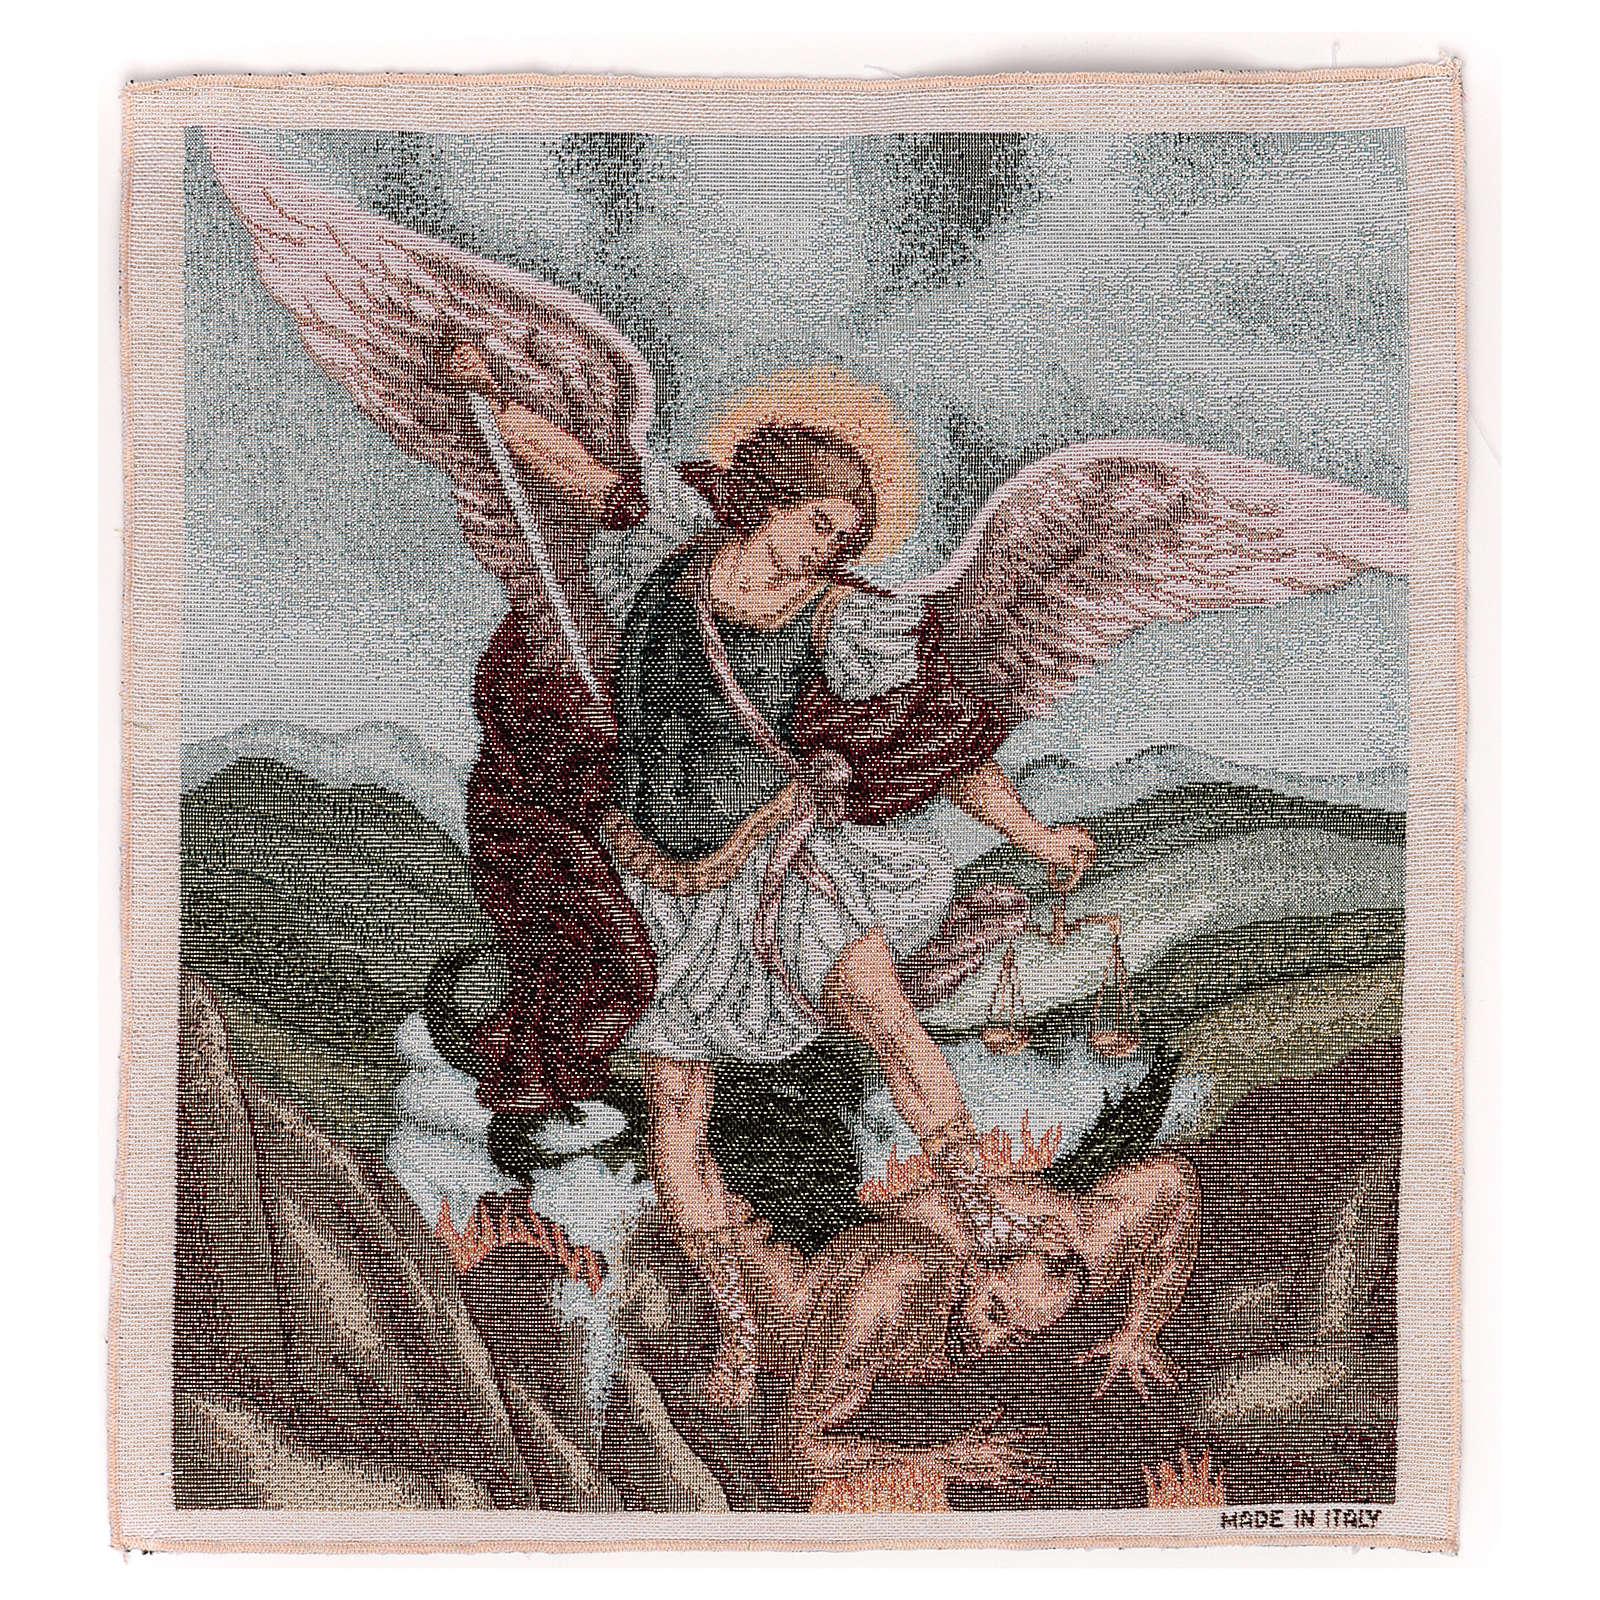 Arazzo San Michele Arcangelo 45x40 cm 3